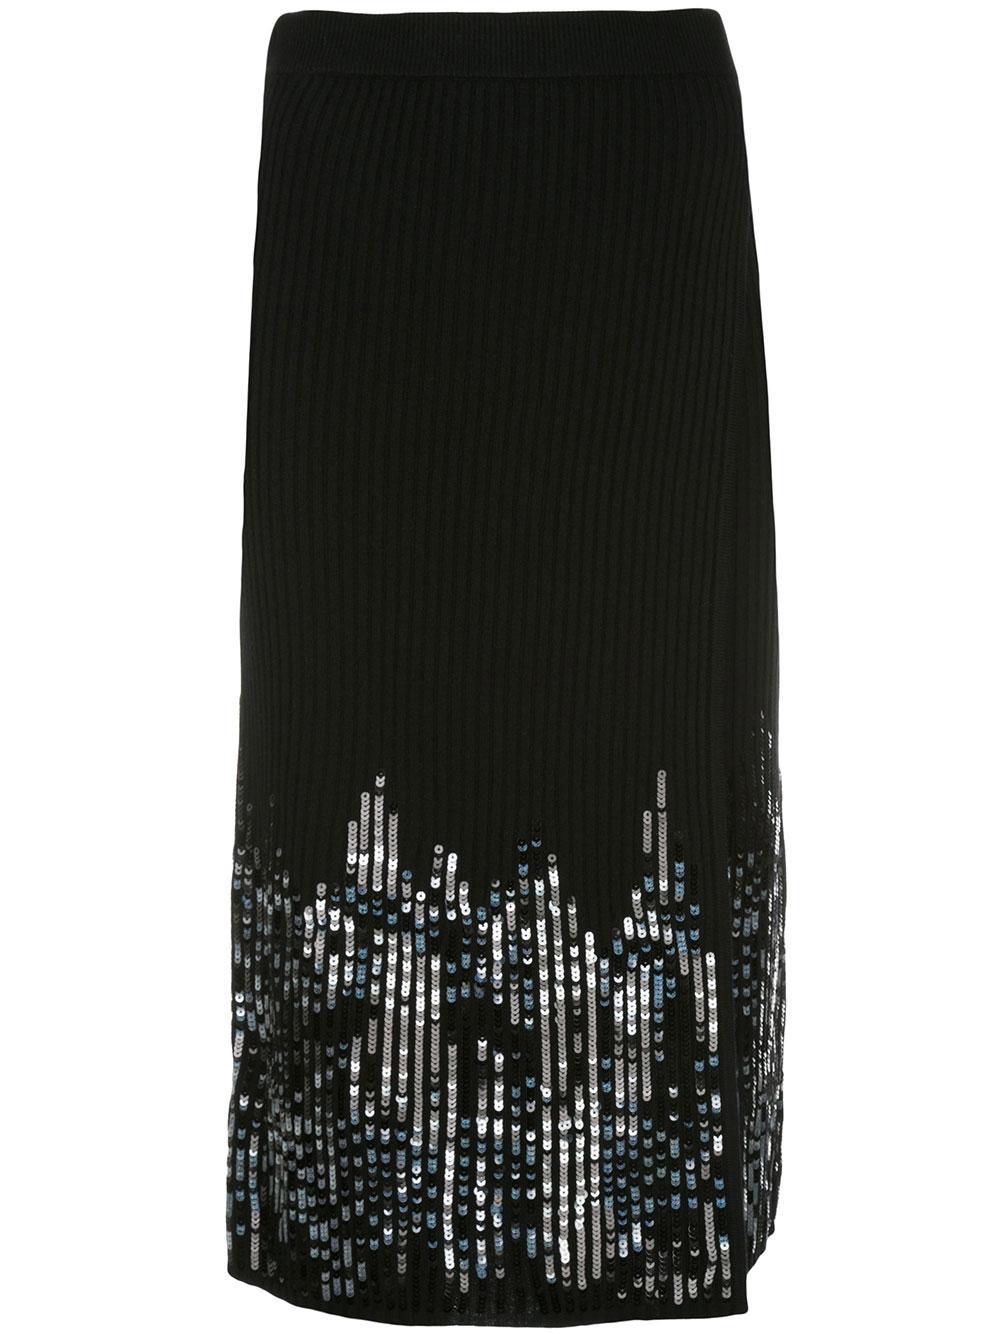 Ribbed Sequin Front Slit Skirt Item # 120-3002-K